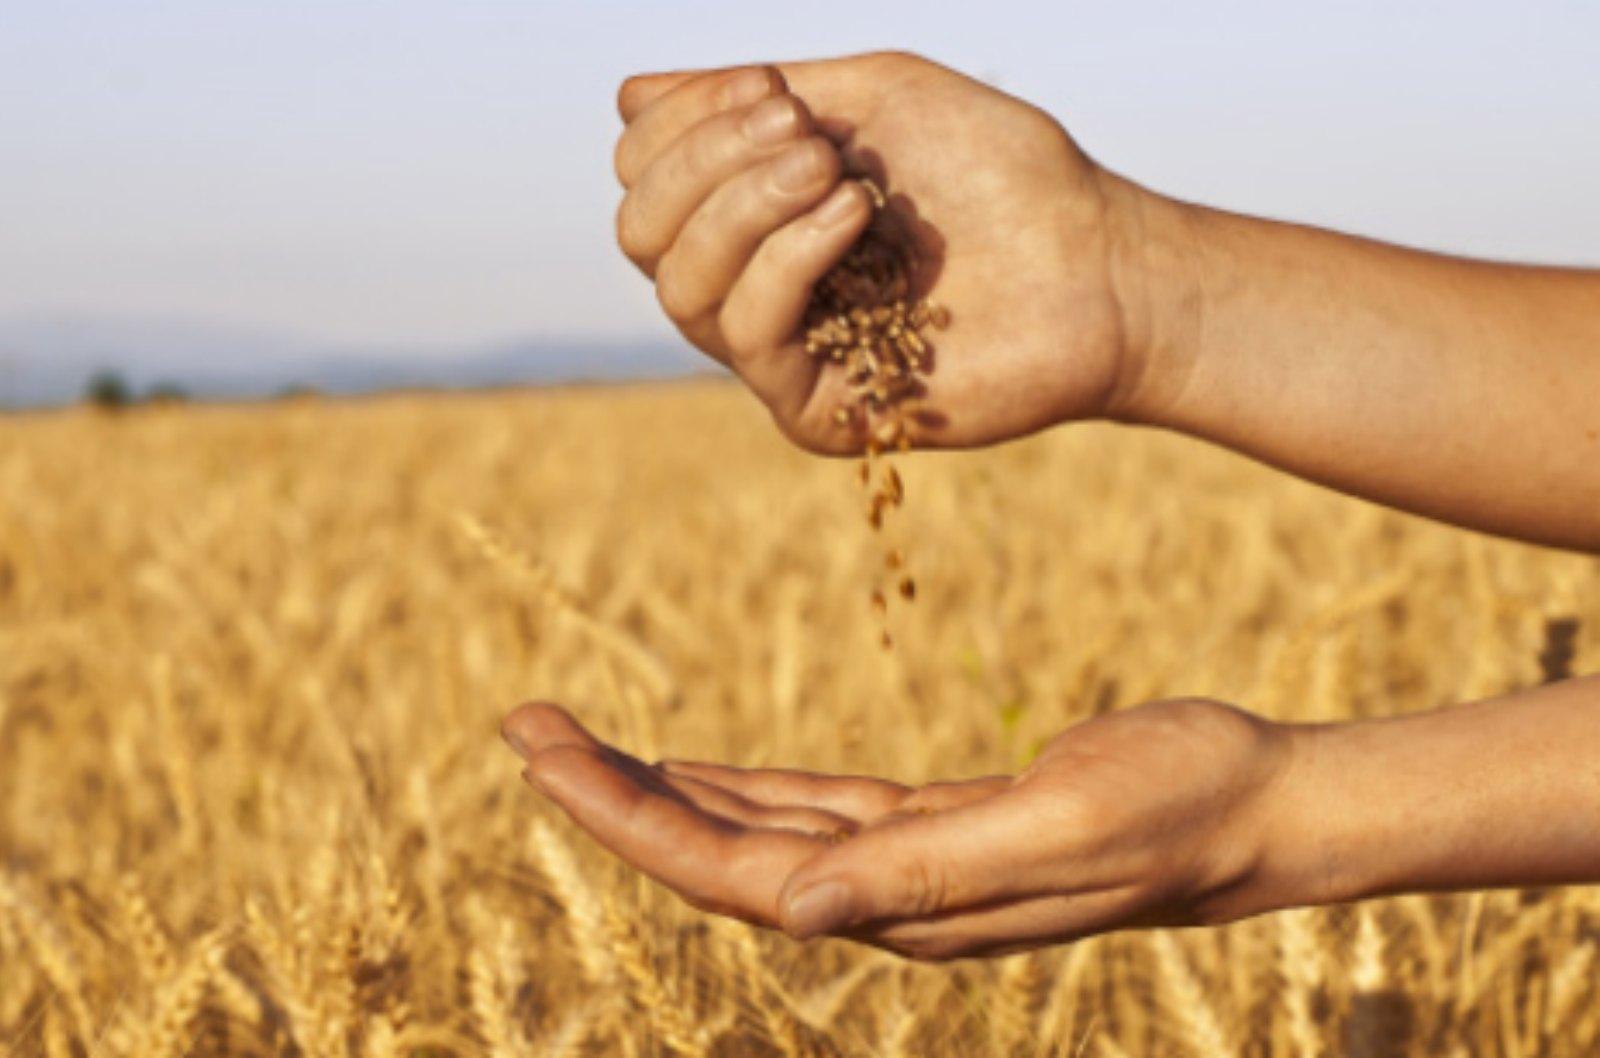 Dried Oats Yield New Opportunities